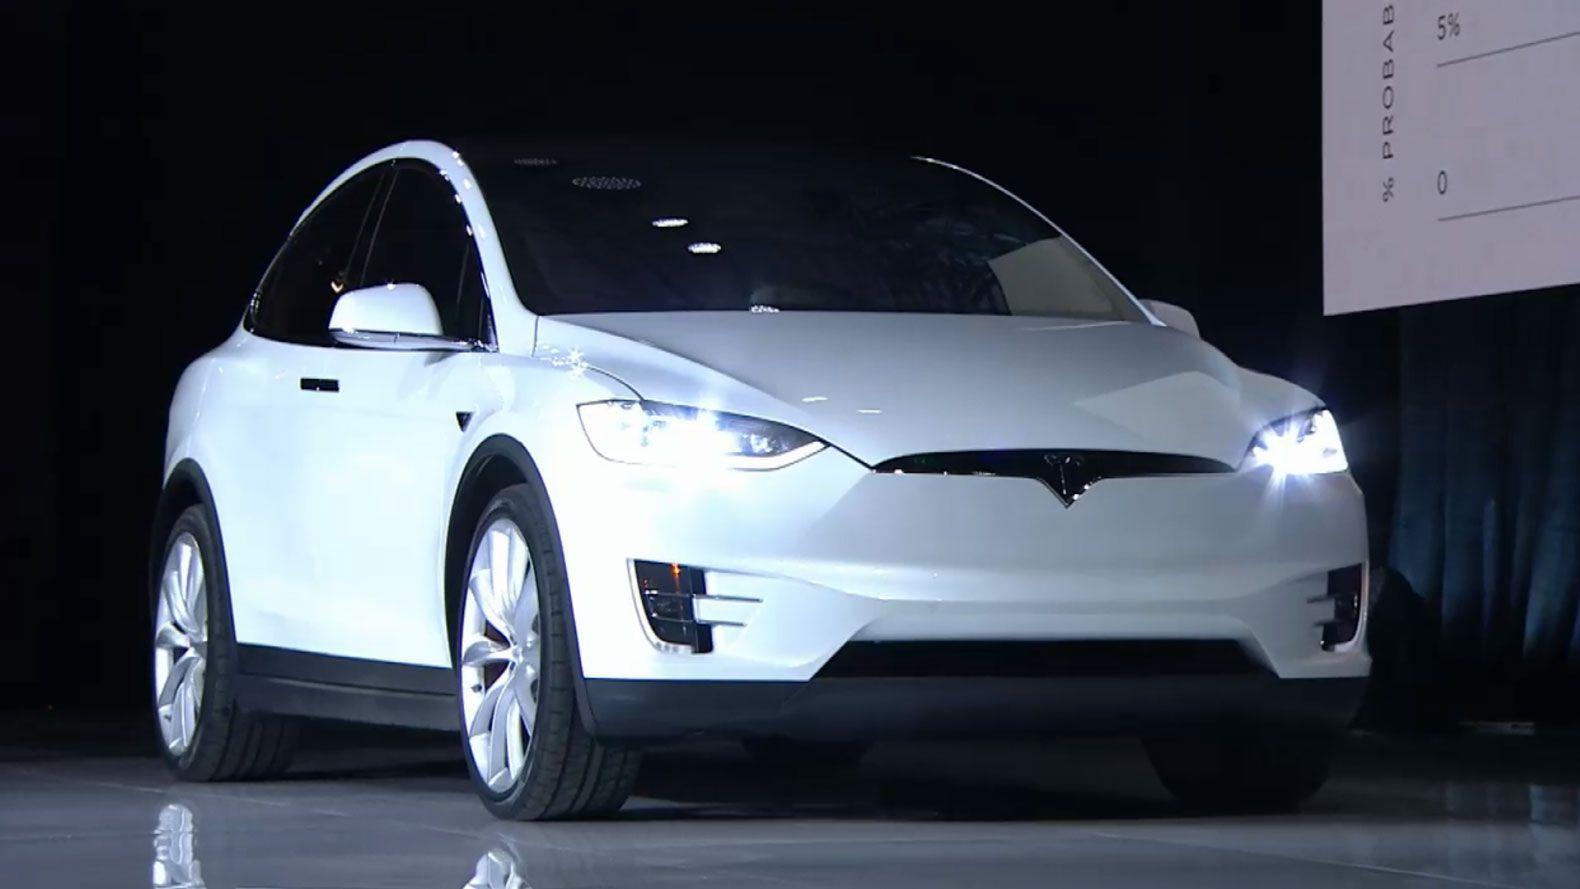 Tesla Unveils The Model X The World S Longest Range Electric Suv Tesla Model X Tesla Model Tesla